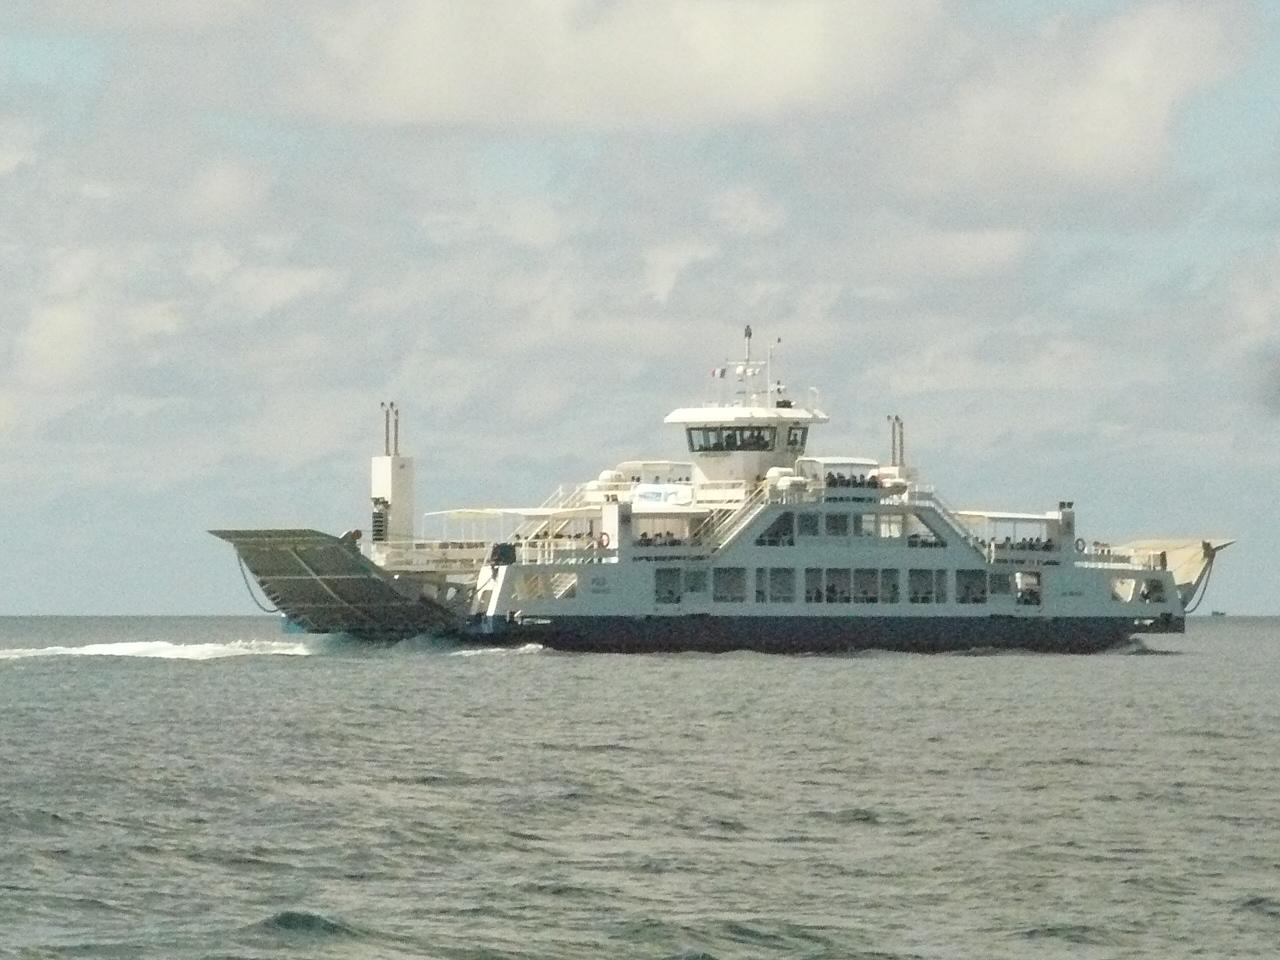 Mayotte_en route_vers petite Terre_41